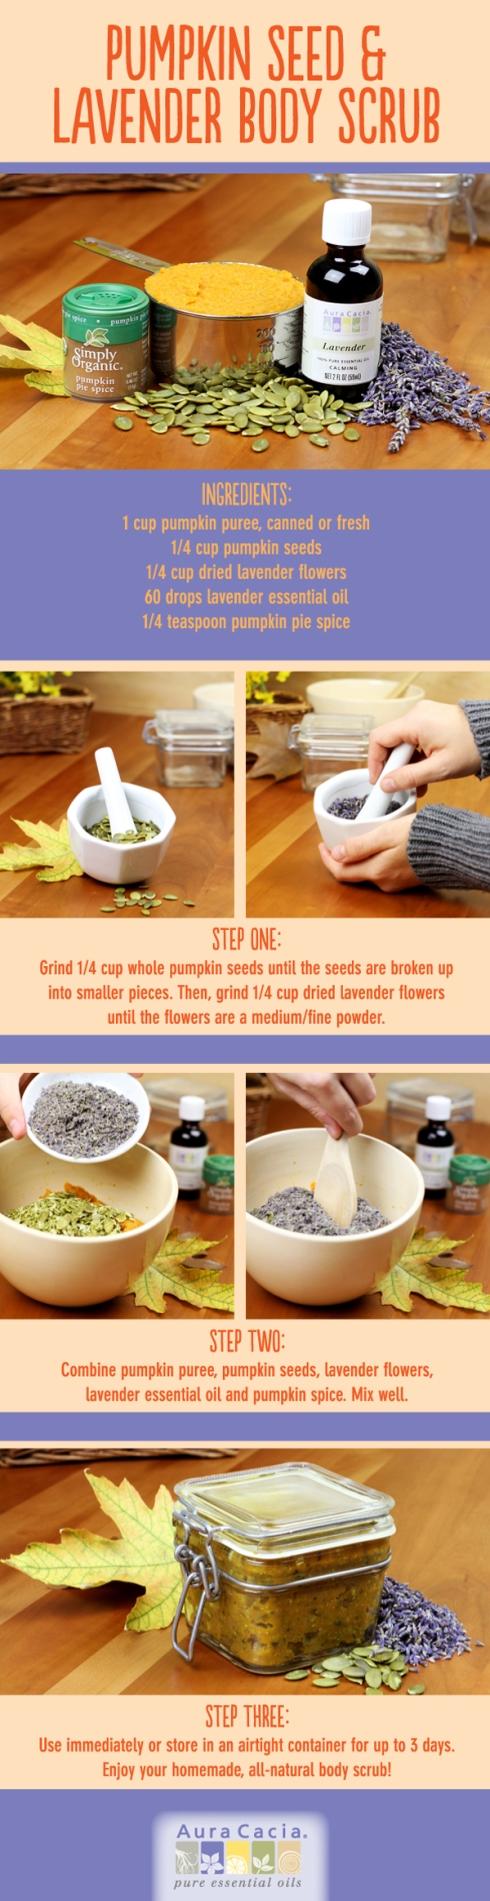 pumpkin seed lavender body scrub